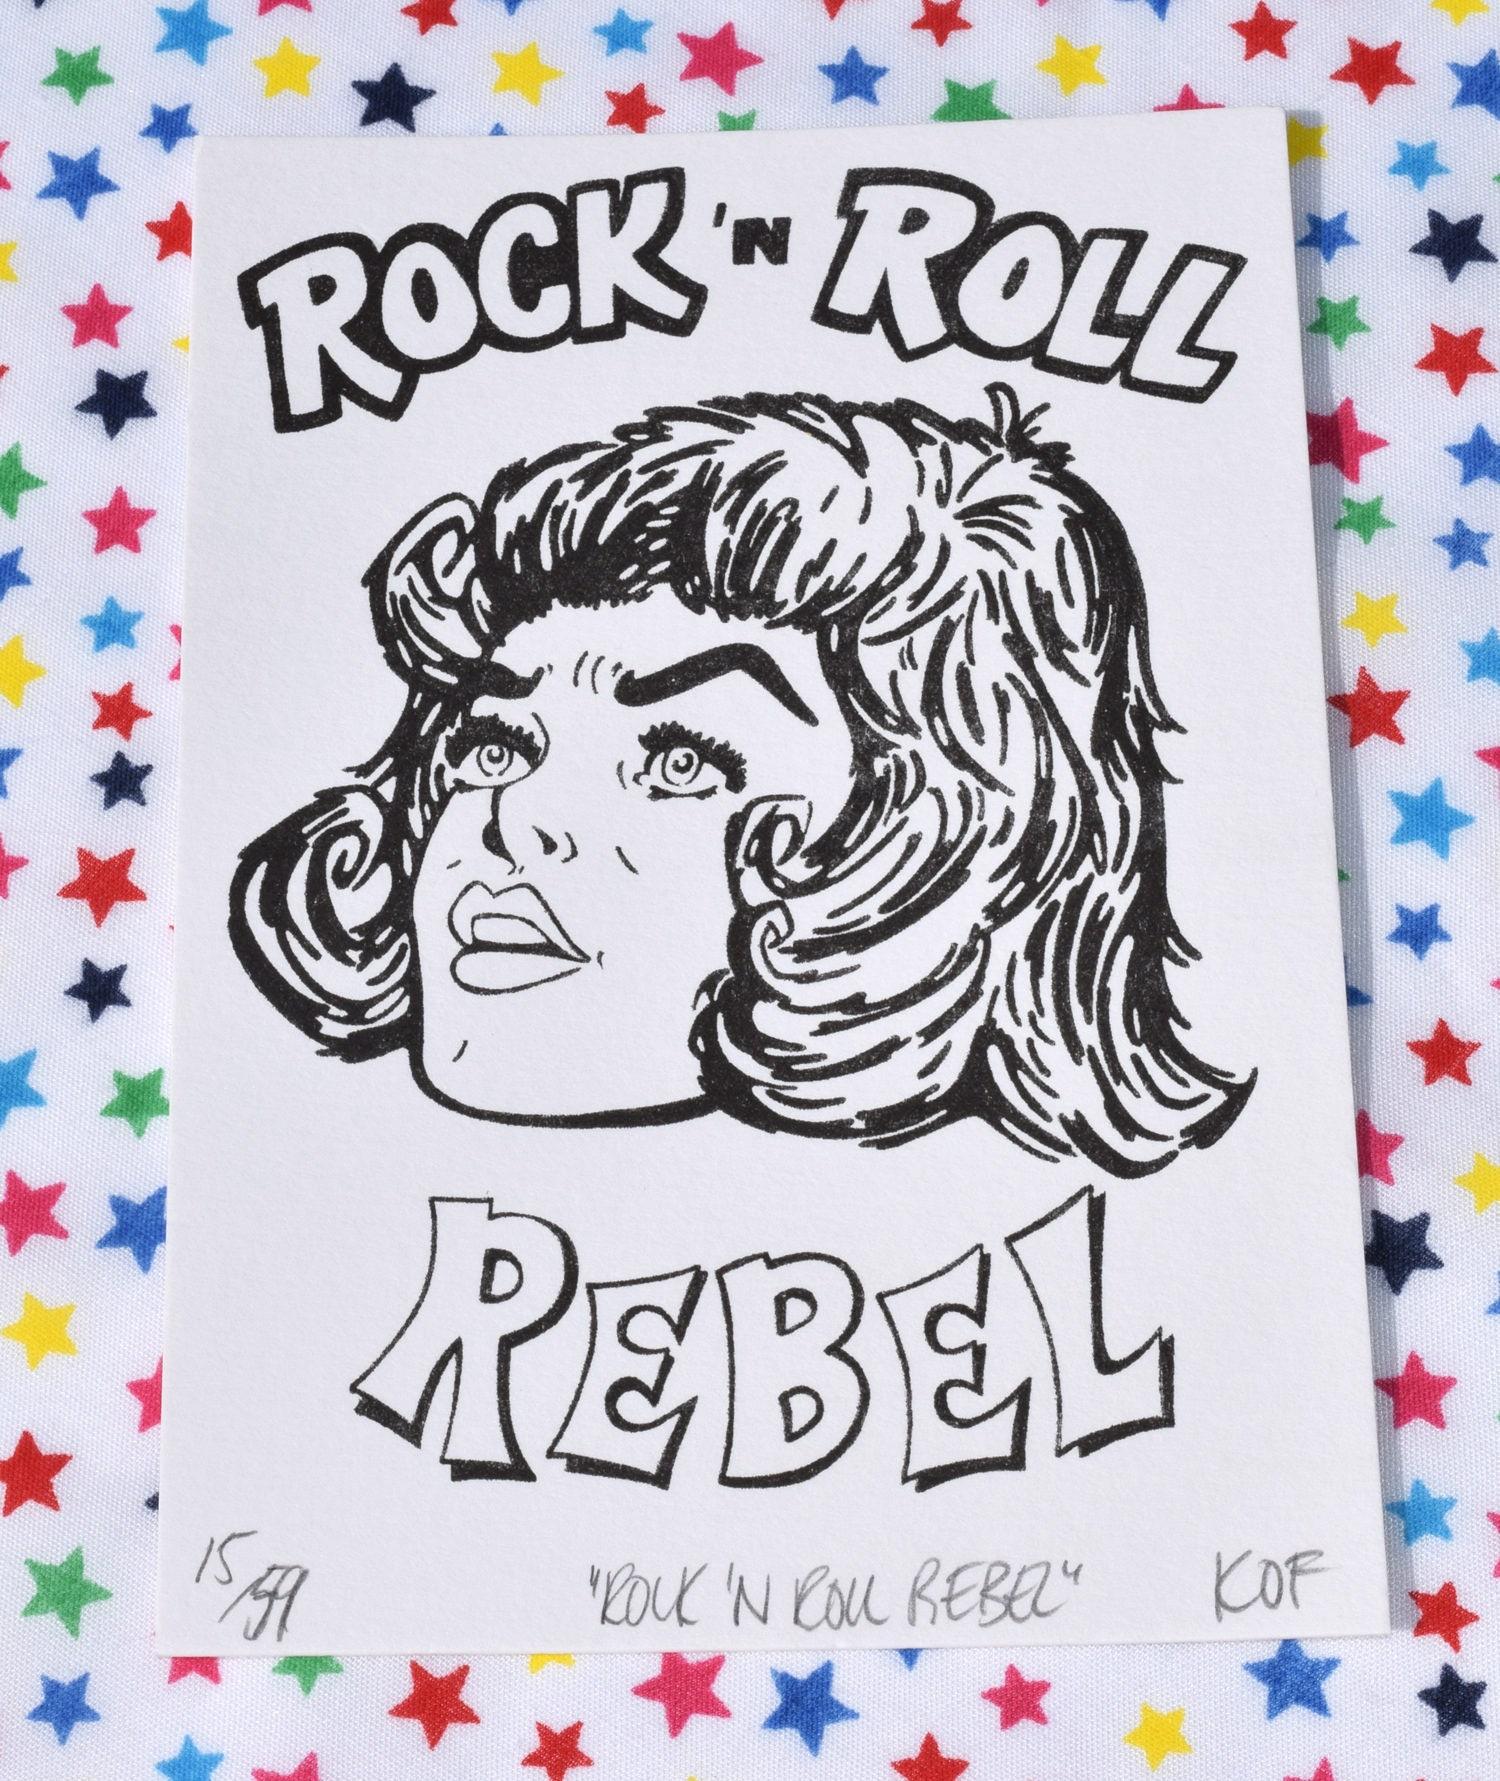 rock 39 n roll print rock 39 n roll rebel retro. Black Bedroom Furniture Sets. Home Design Ideas